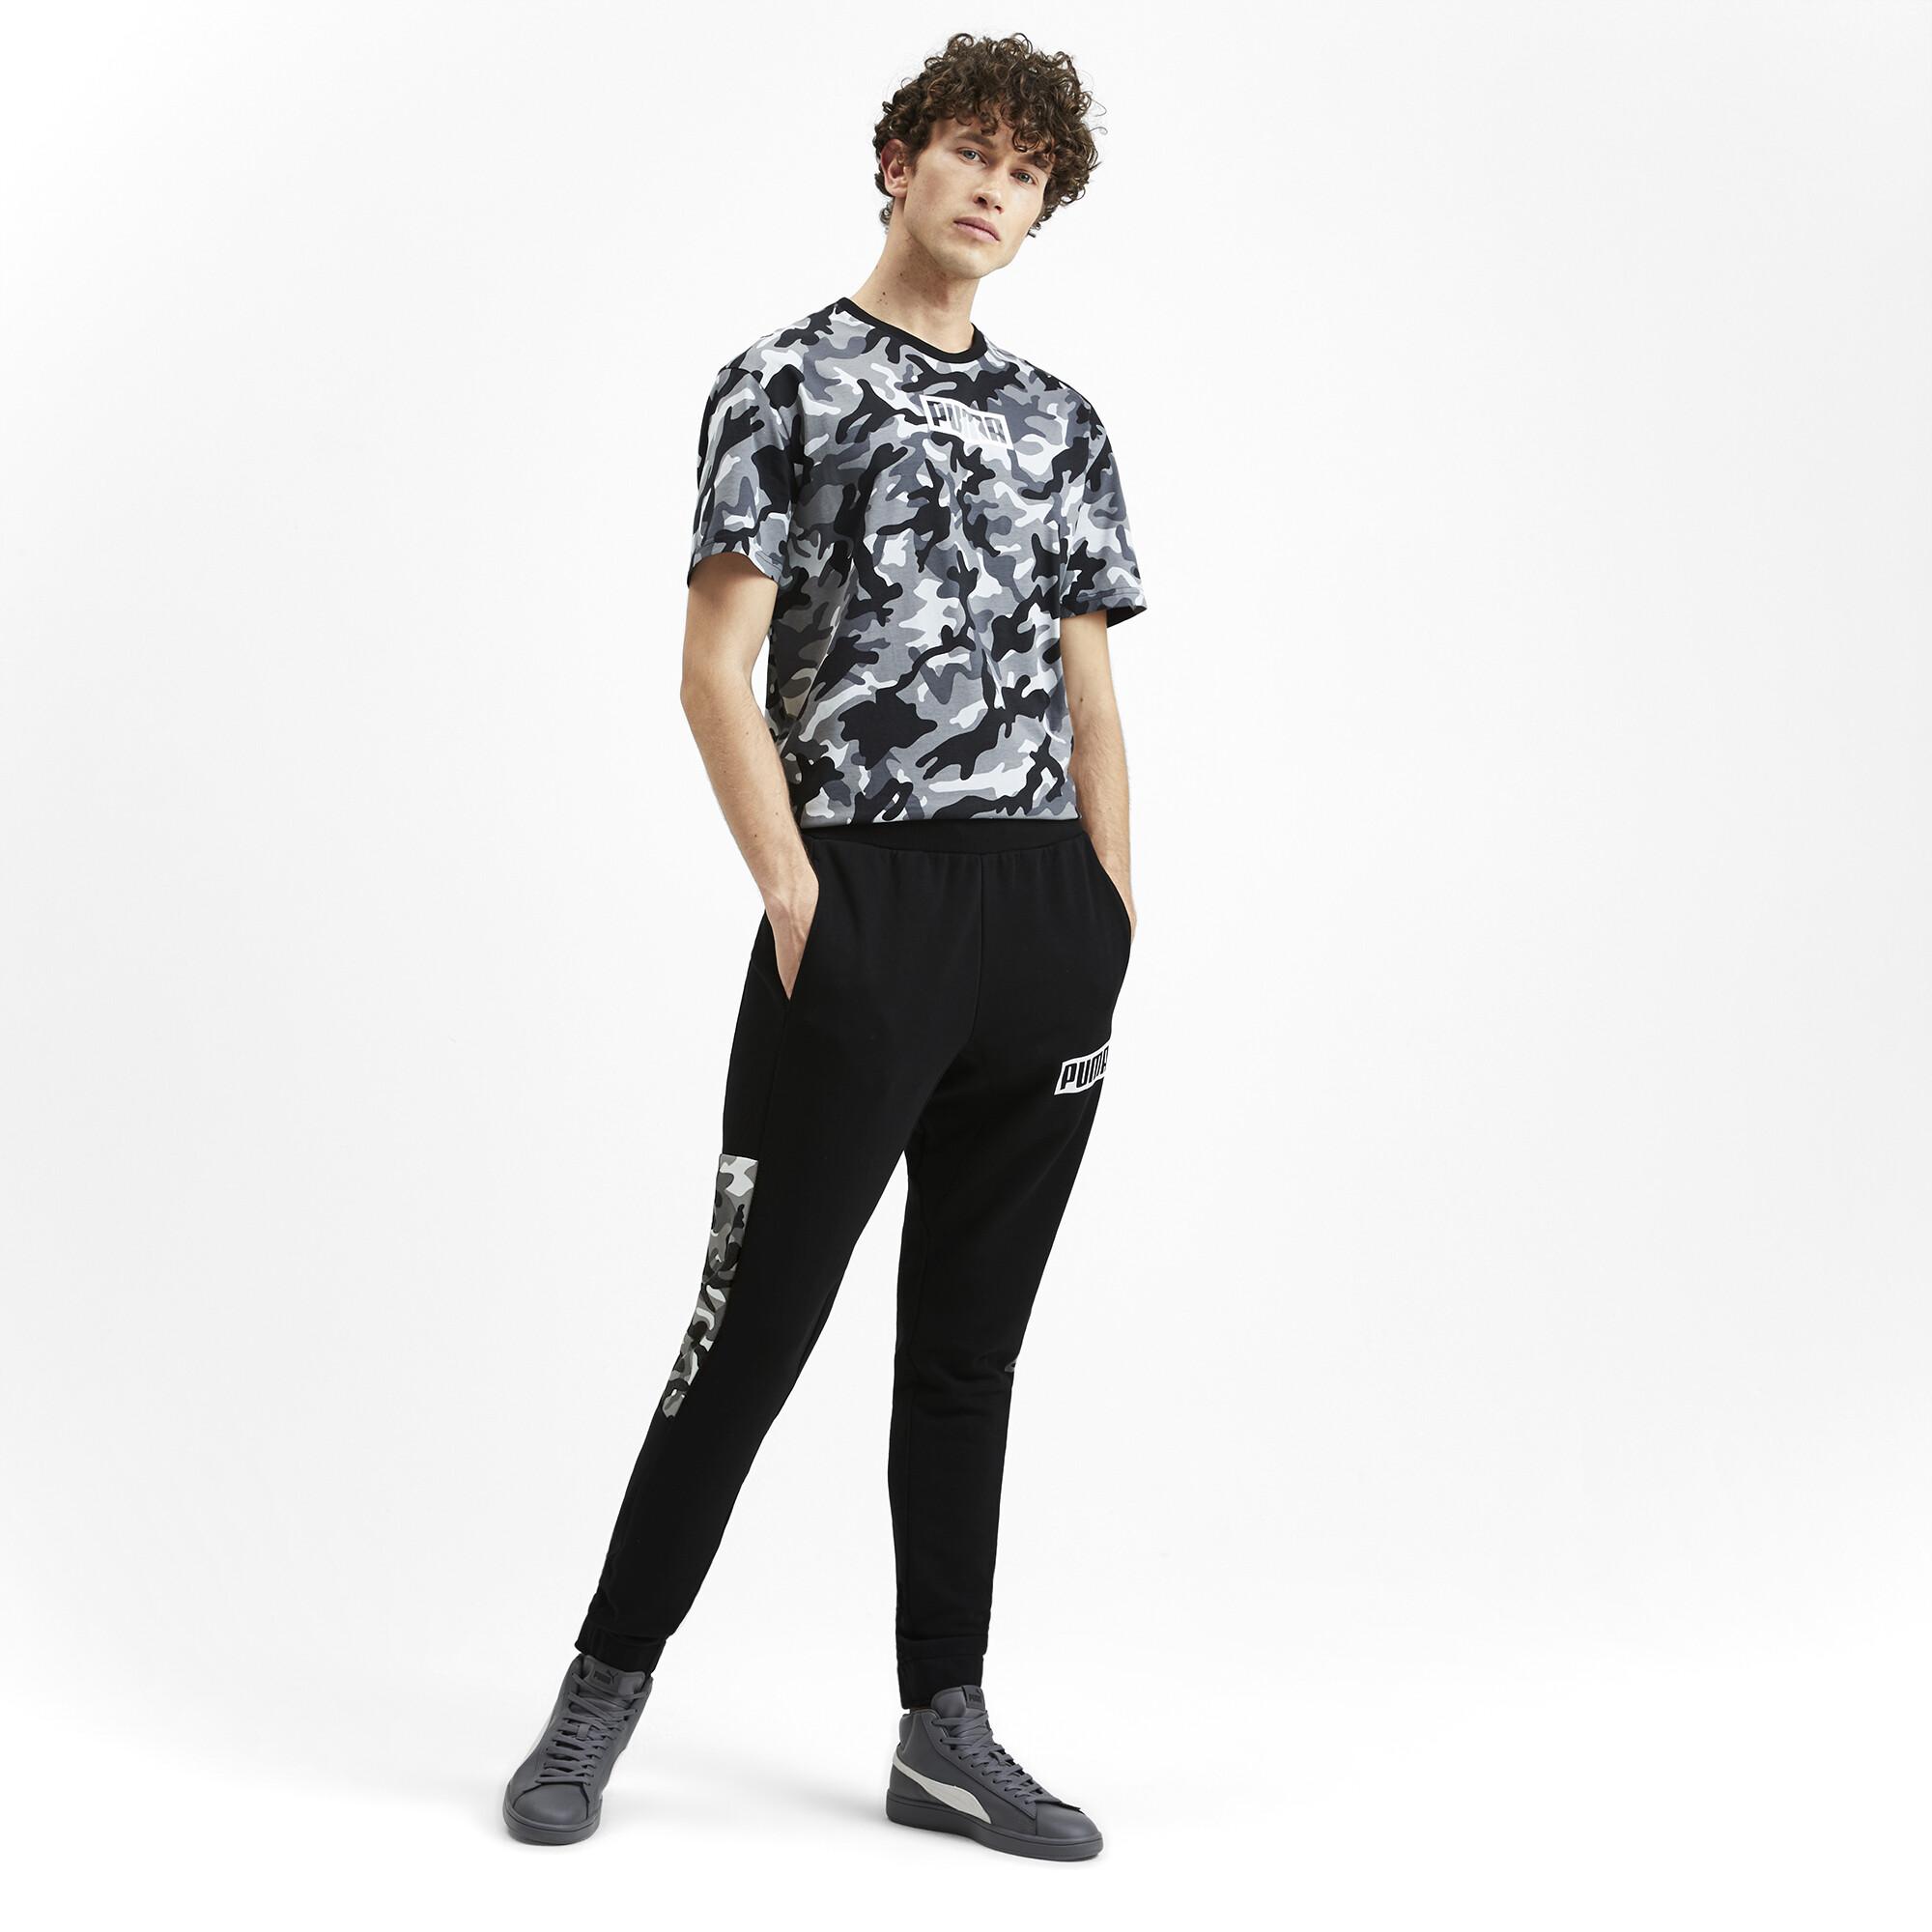 PUMA-Rebel-Camo-Men-039-s-Pants-Men-Knitted-Pants-Basics thumbnail 6